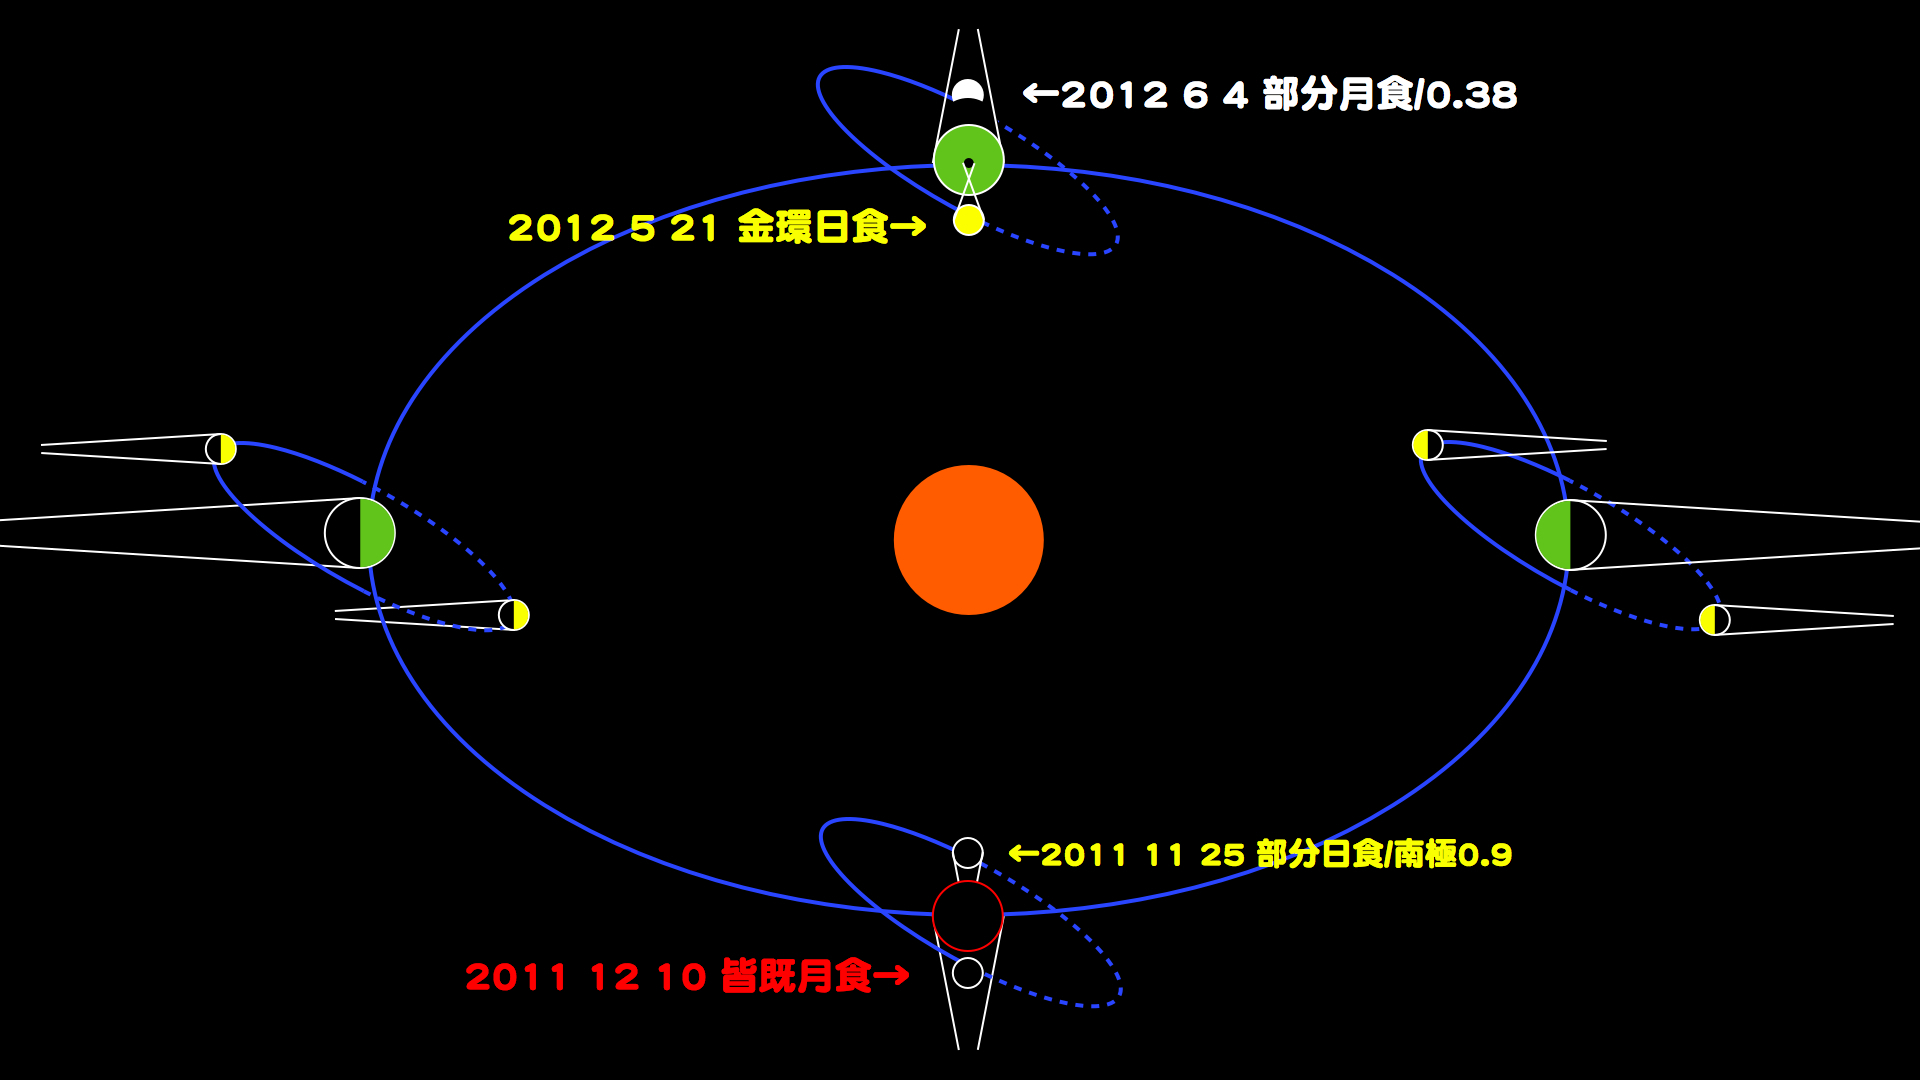 http://www.ncsm.city.nagoya.jp/study/astro/moon.001.jpg